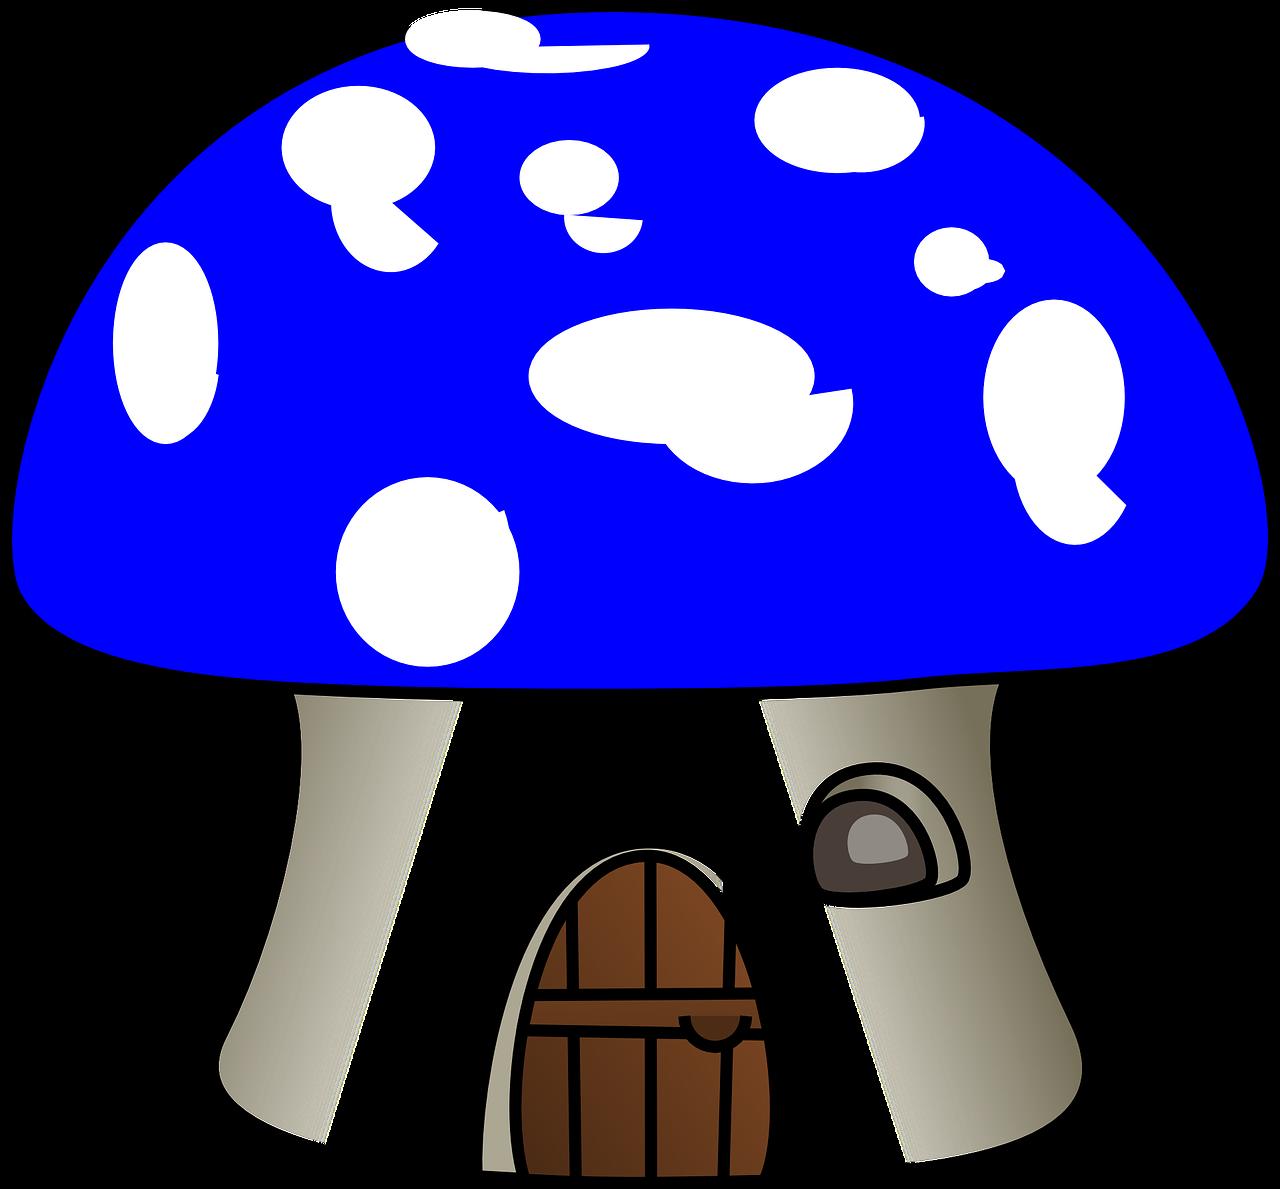 Mushroom House Igloo Door PNG Image - Picpng clip art free